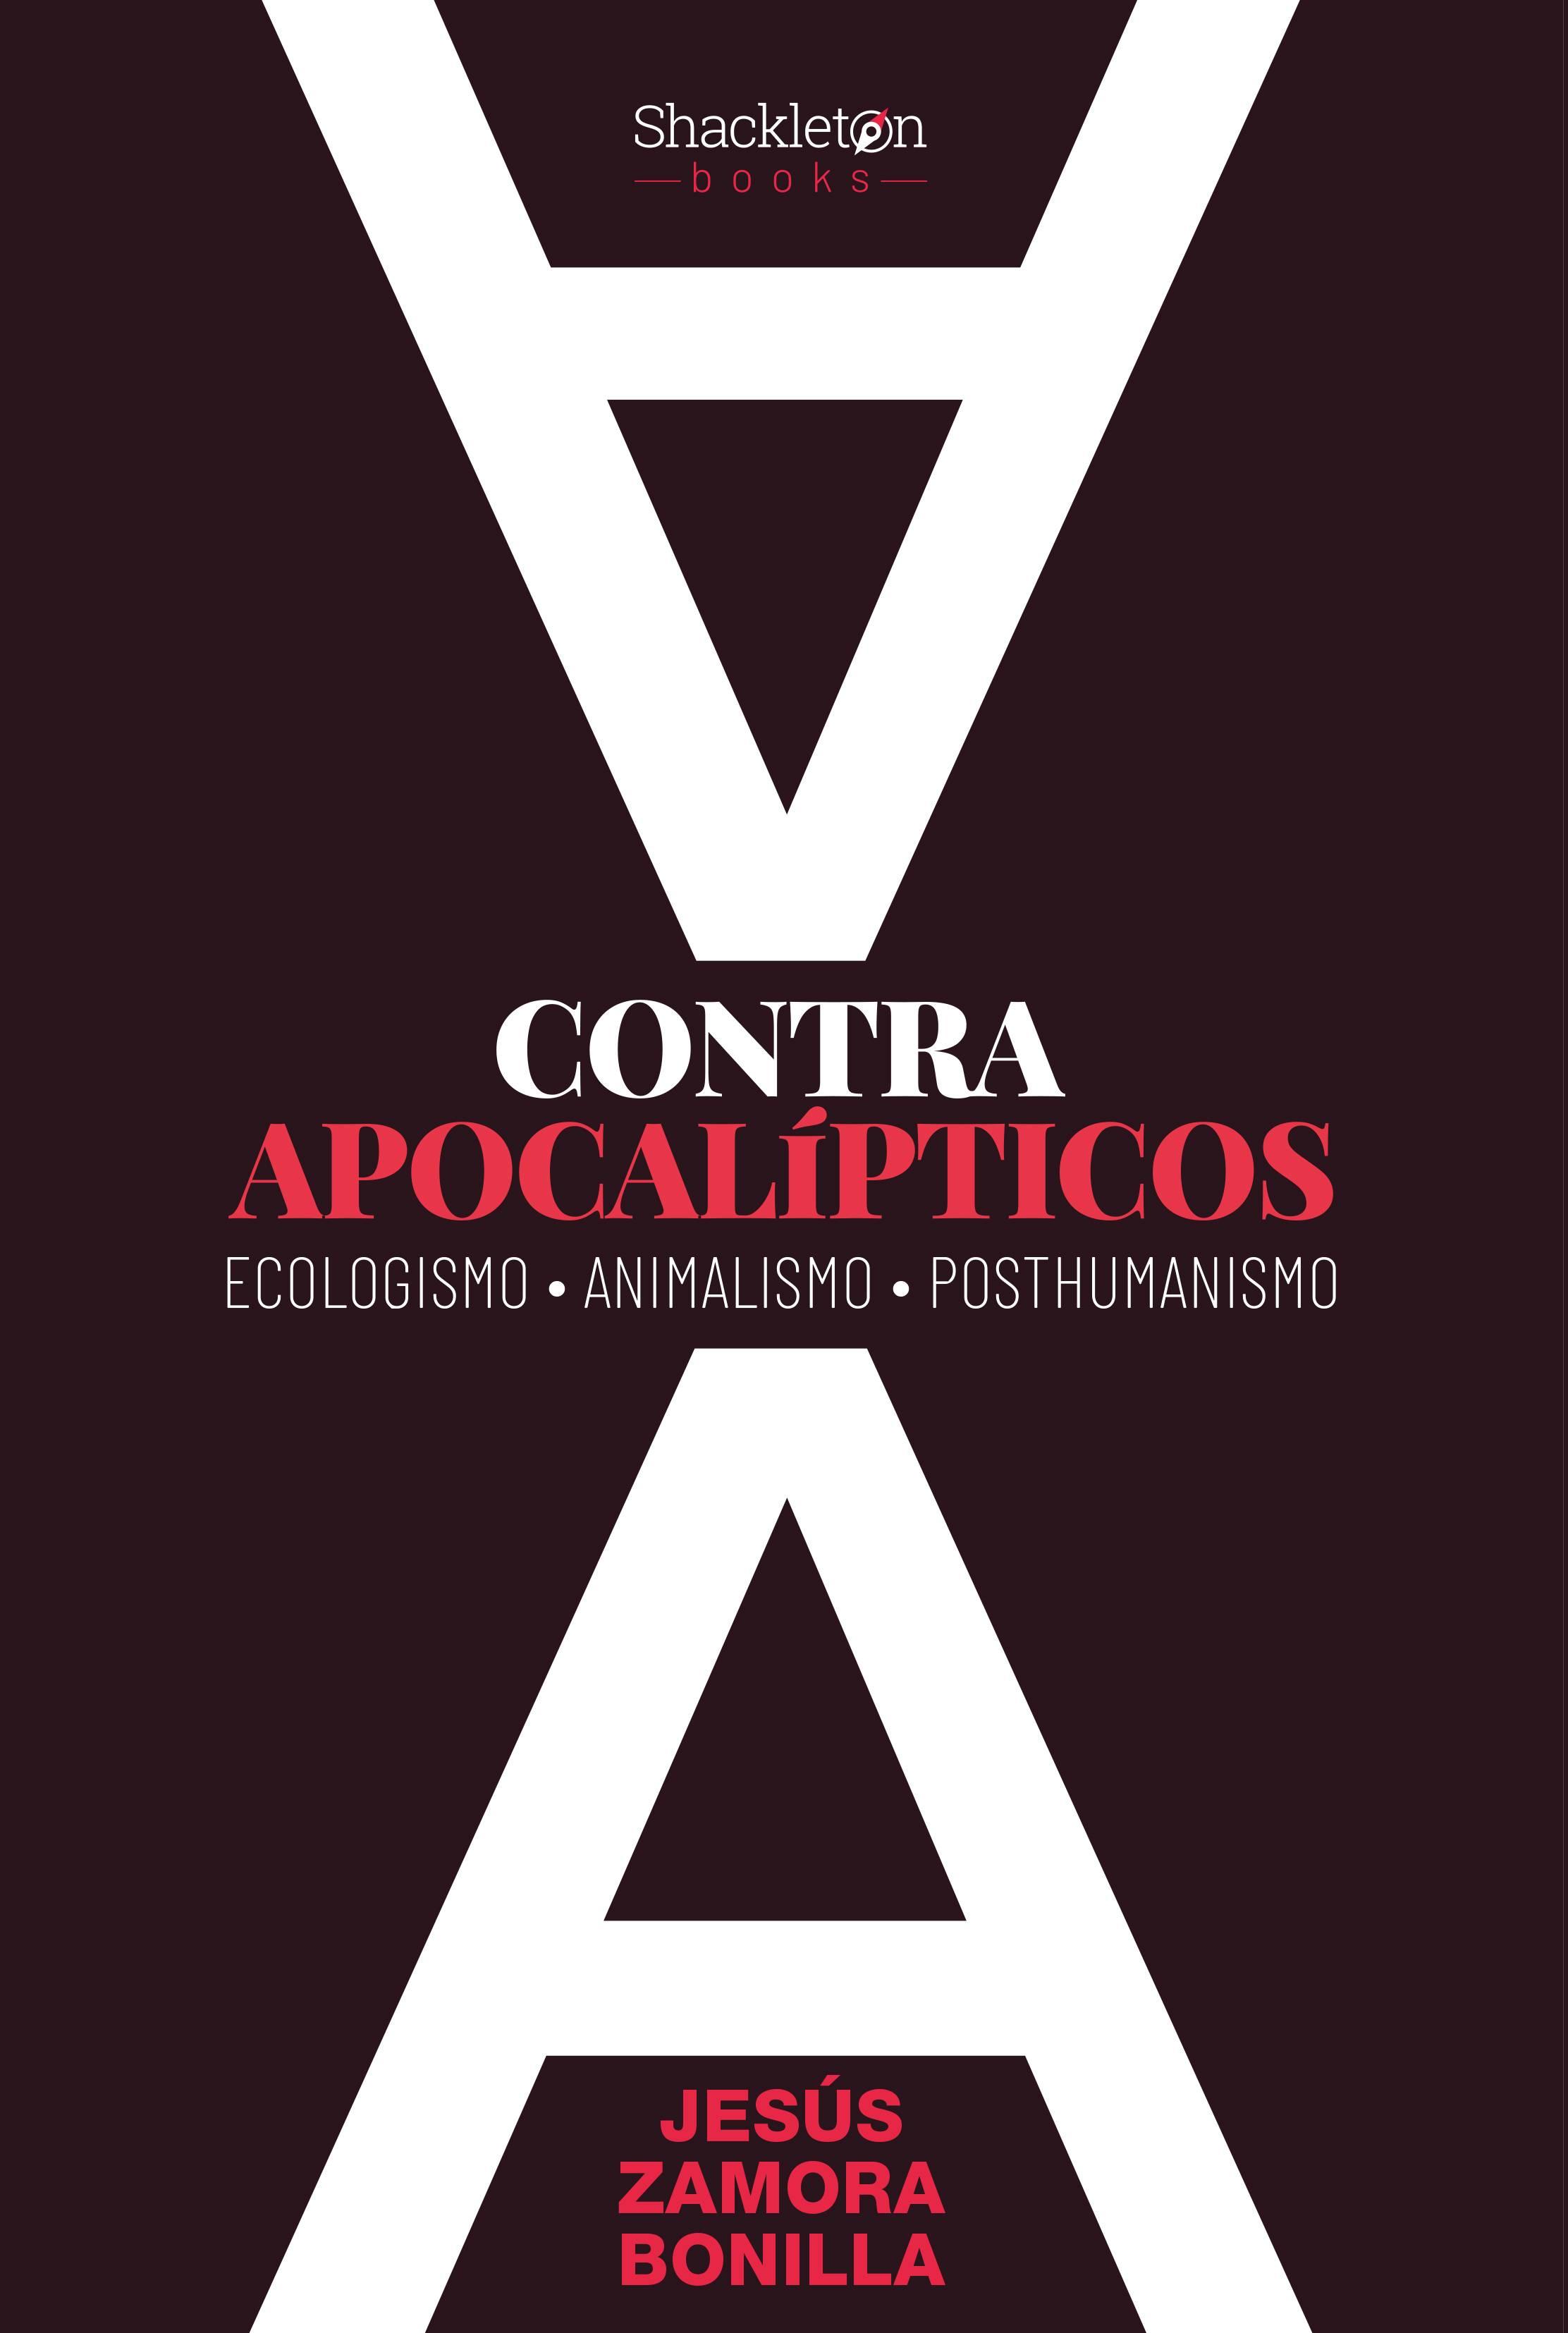 Contra apocalípticos